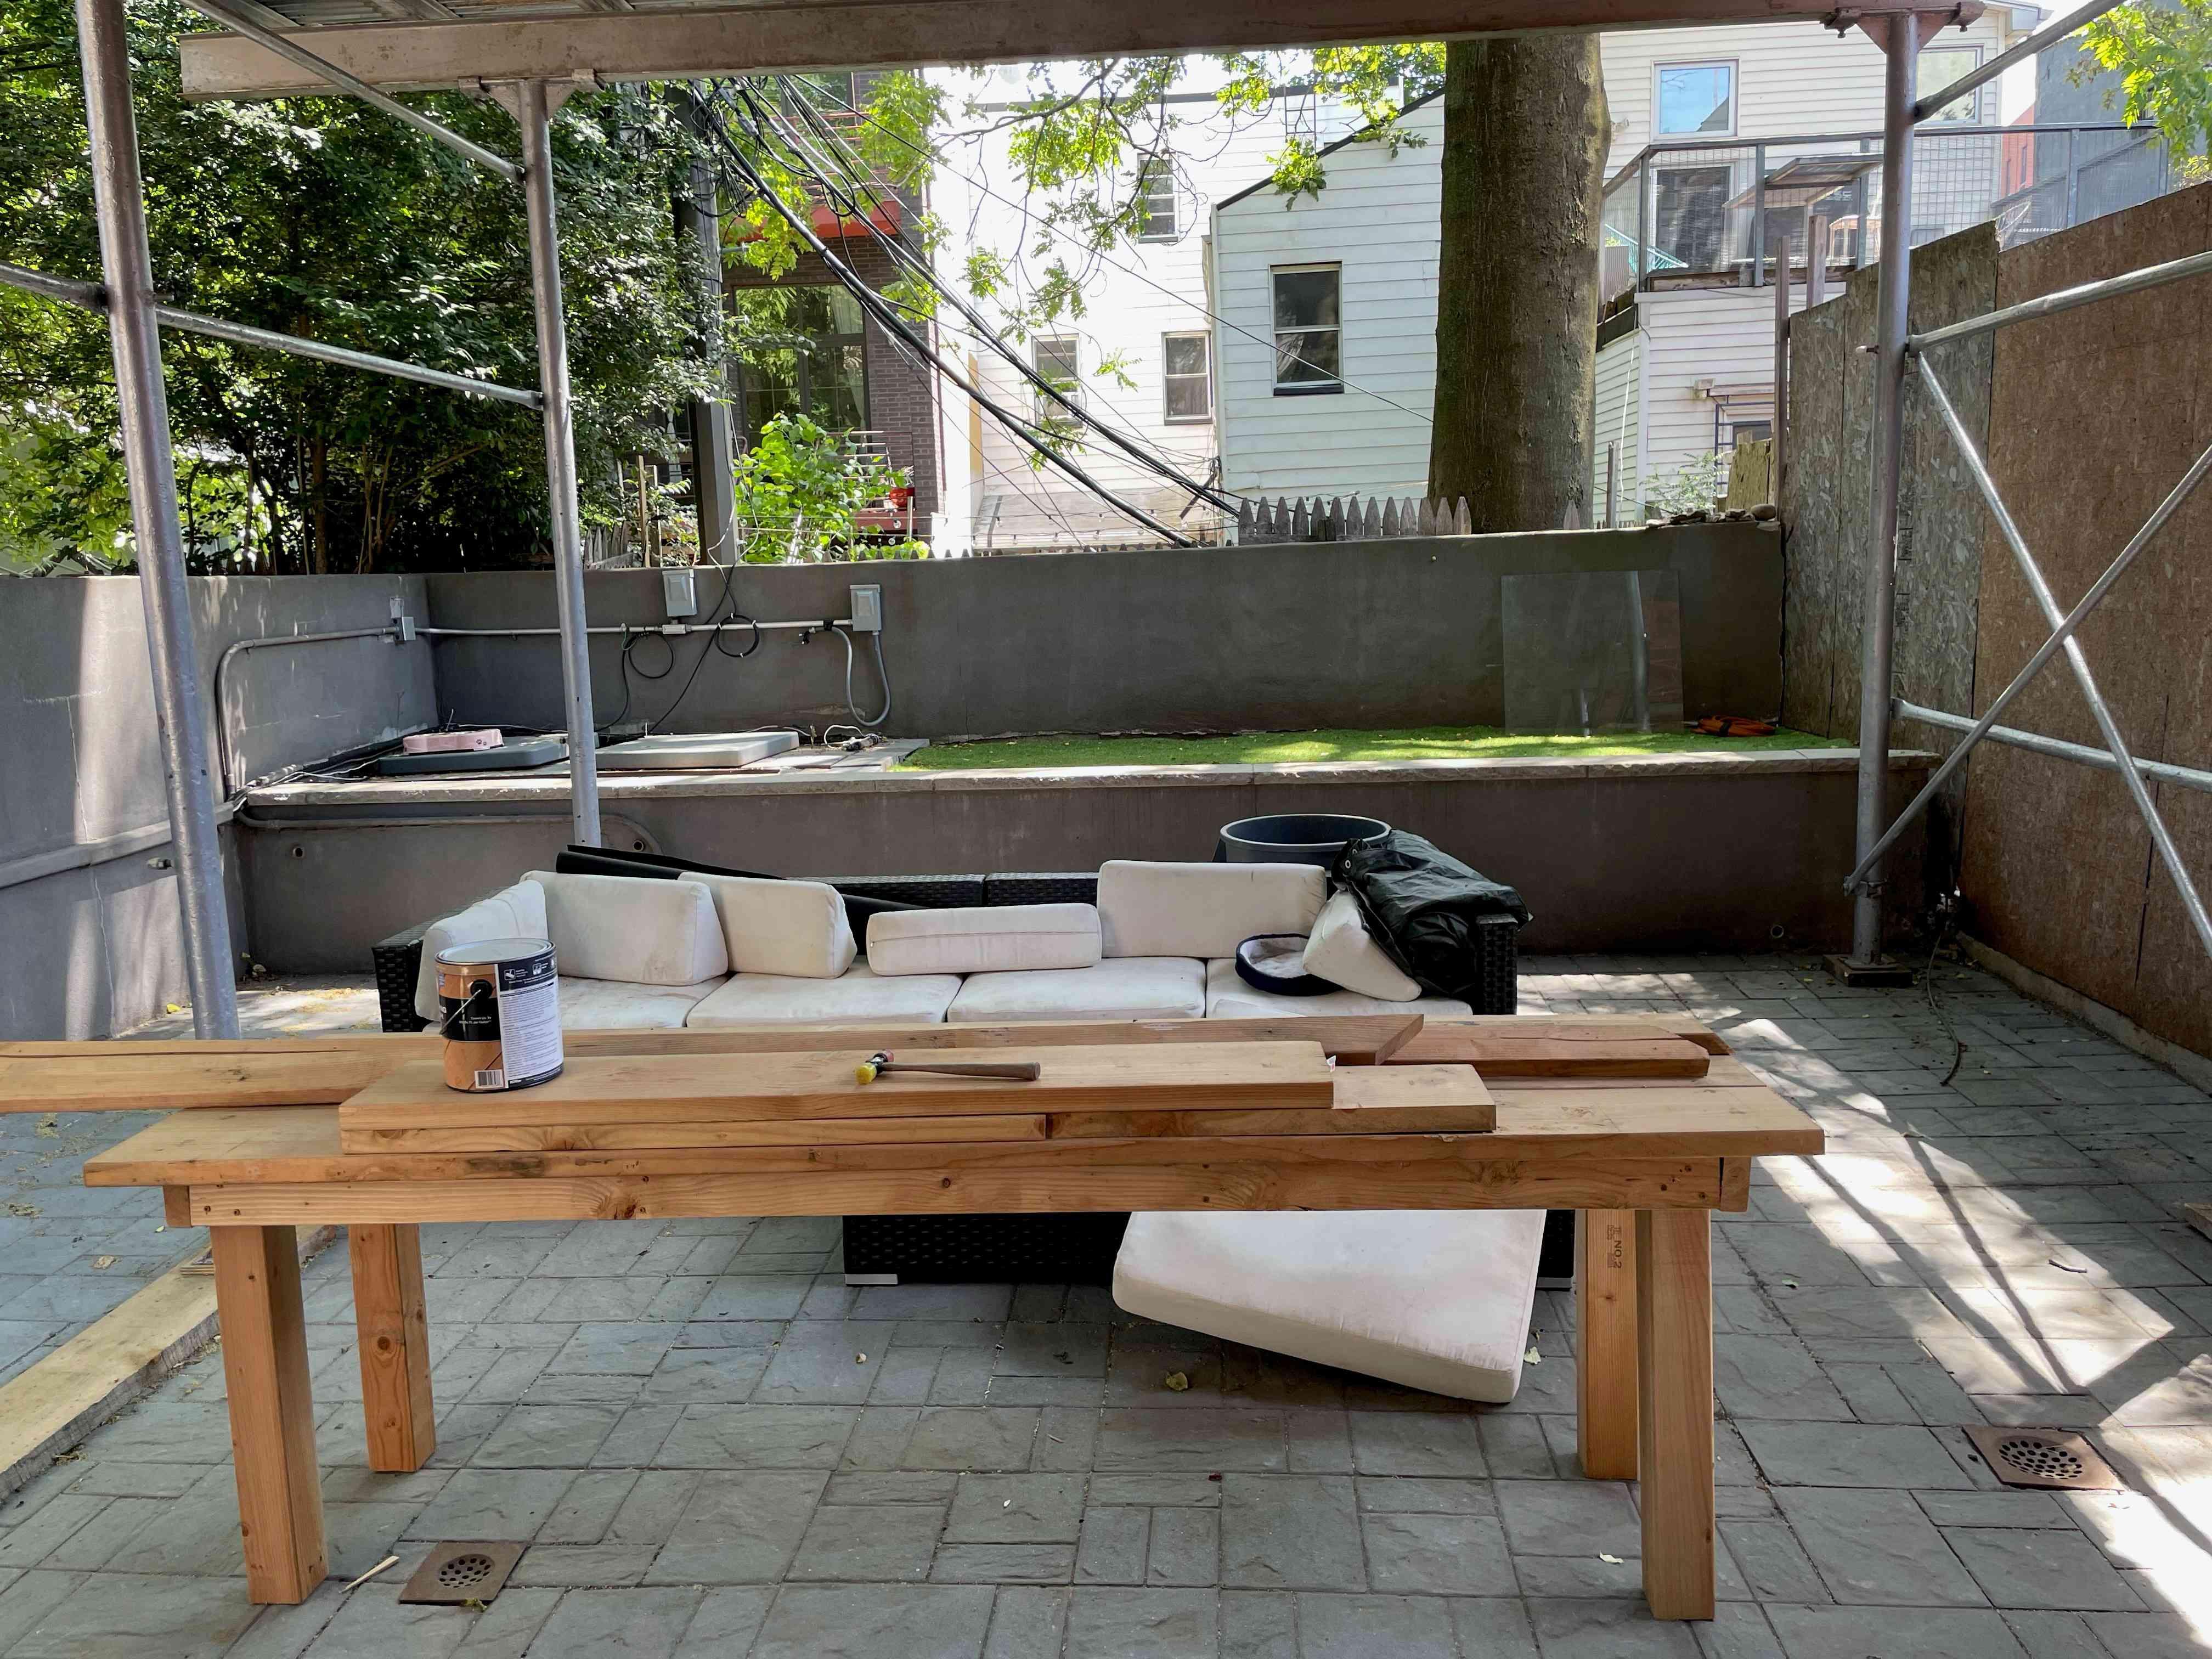 Jamie Chung's Brooklyn backyard under renovation